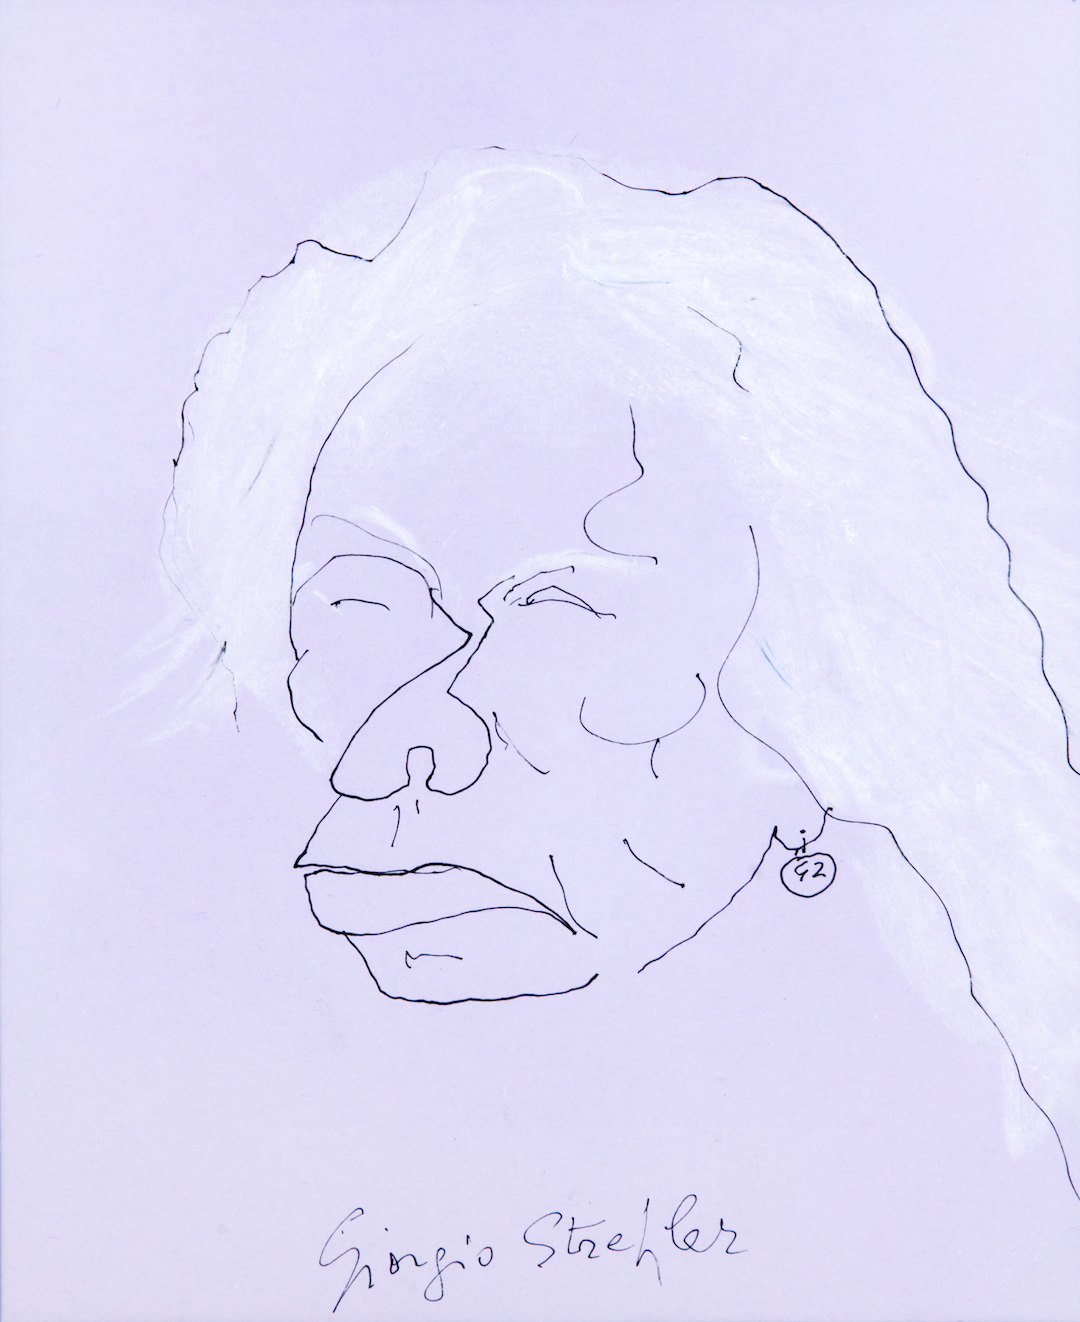 Giorgio Strehler, caricatura